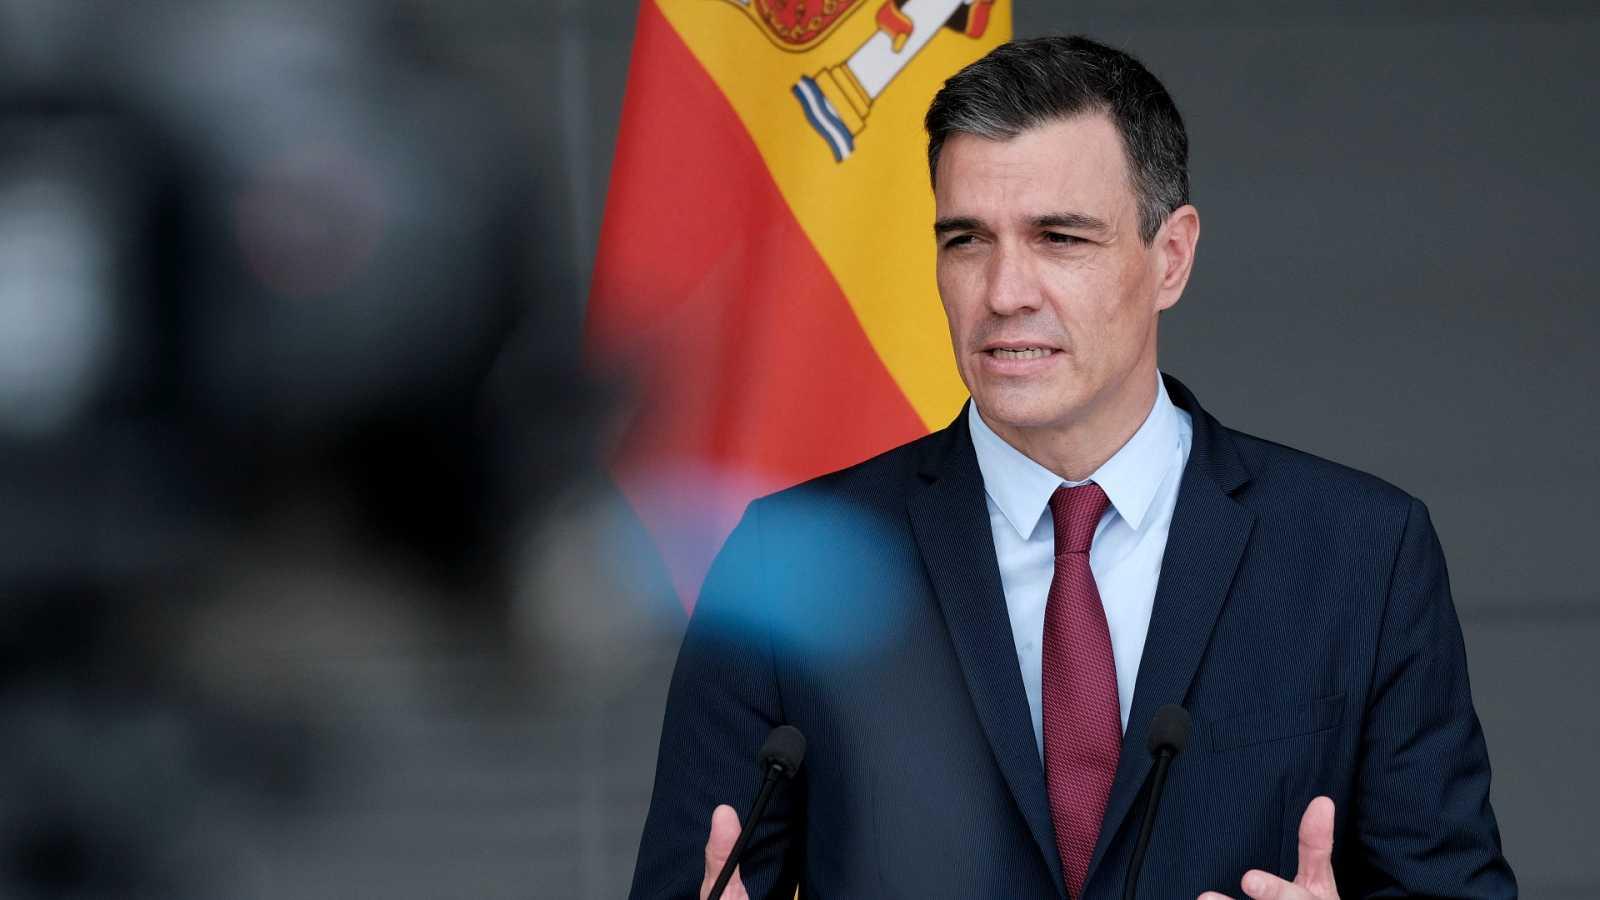 Sánchez Garzón